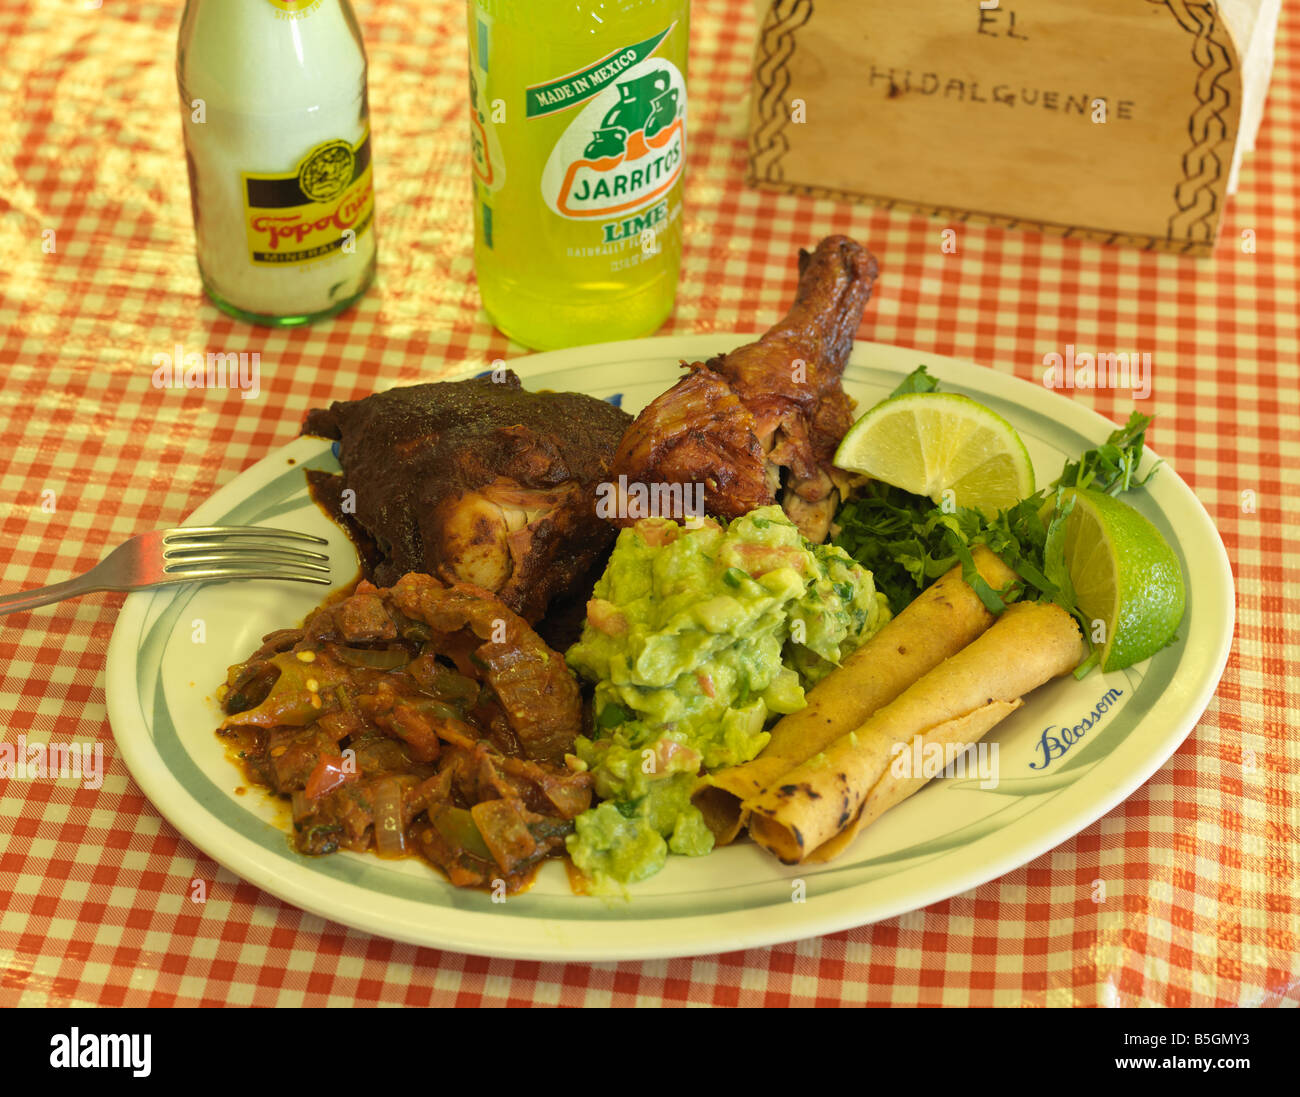 Tex Mex Food Usa Stockfotos & Tex Mex Food Usa Bilder - Alamy